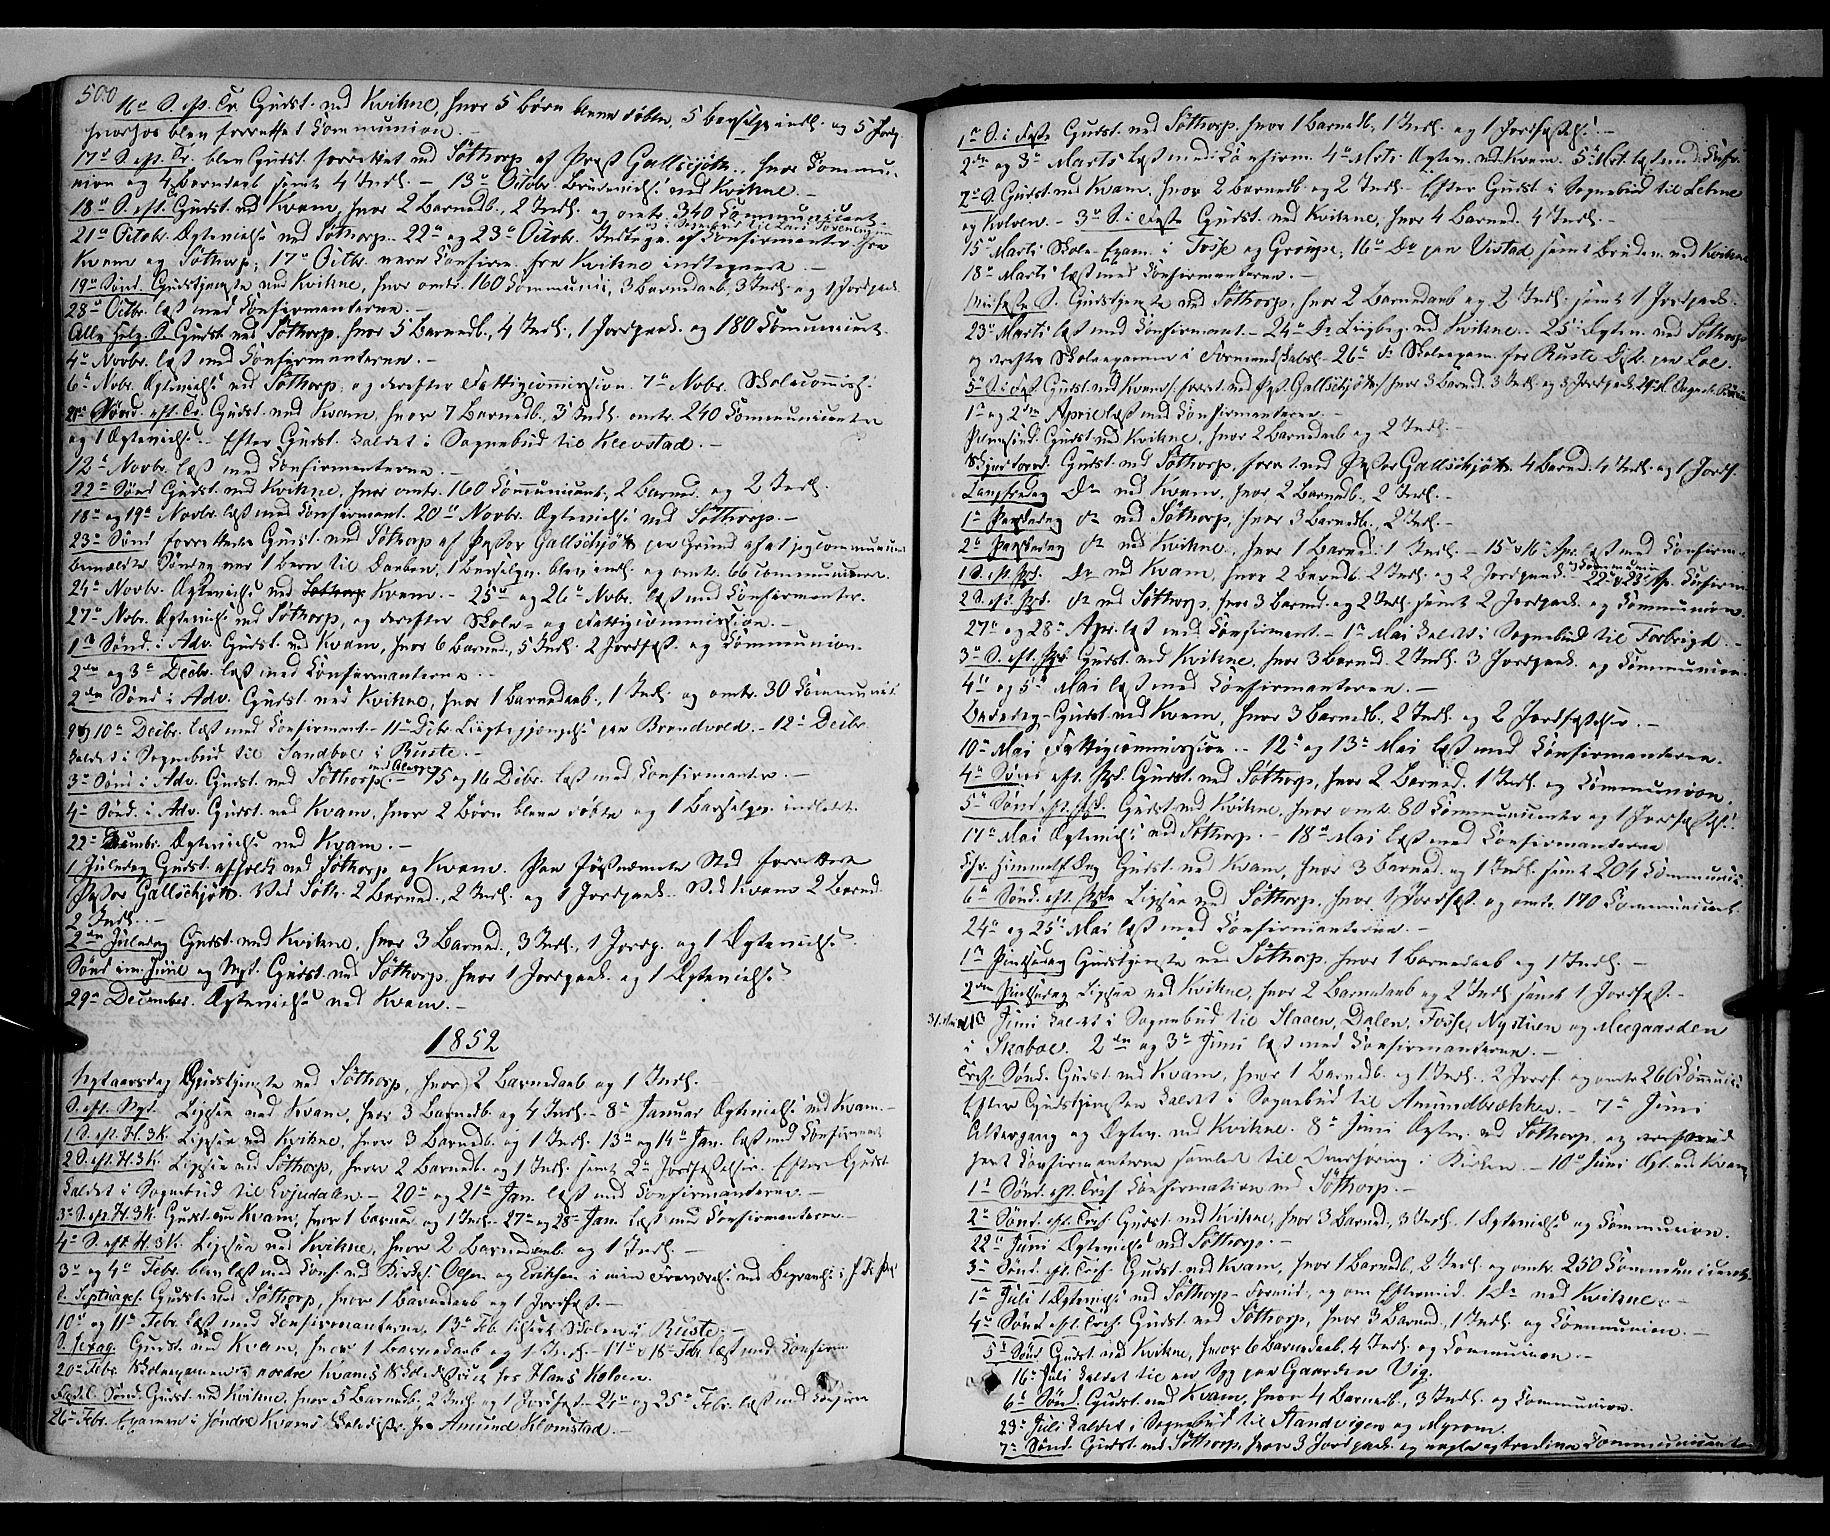 SAH, Nord-Fron prestekontor, Ministerialbok nr. 1, 1851-1864, s. 500